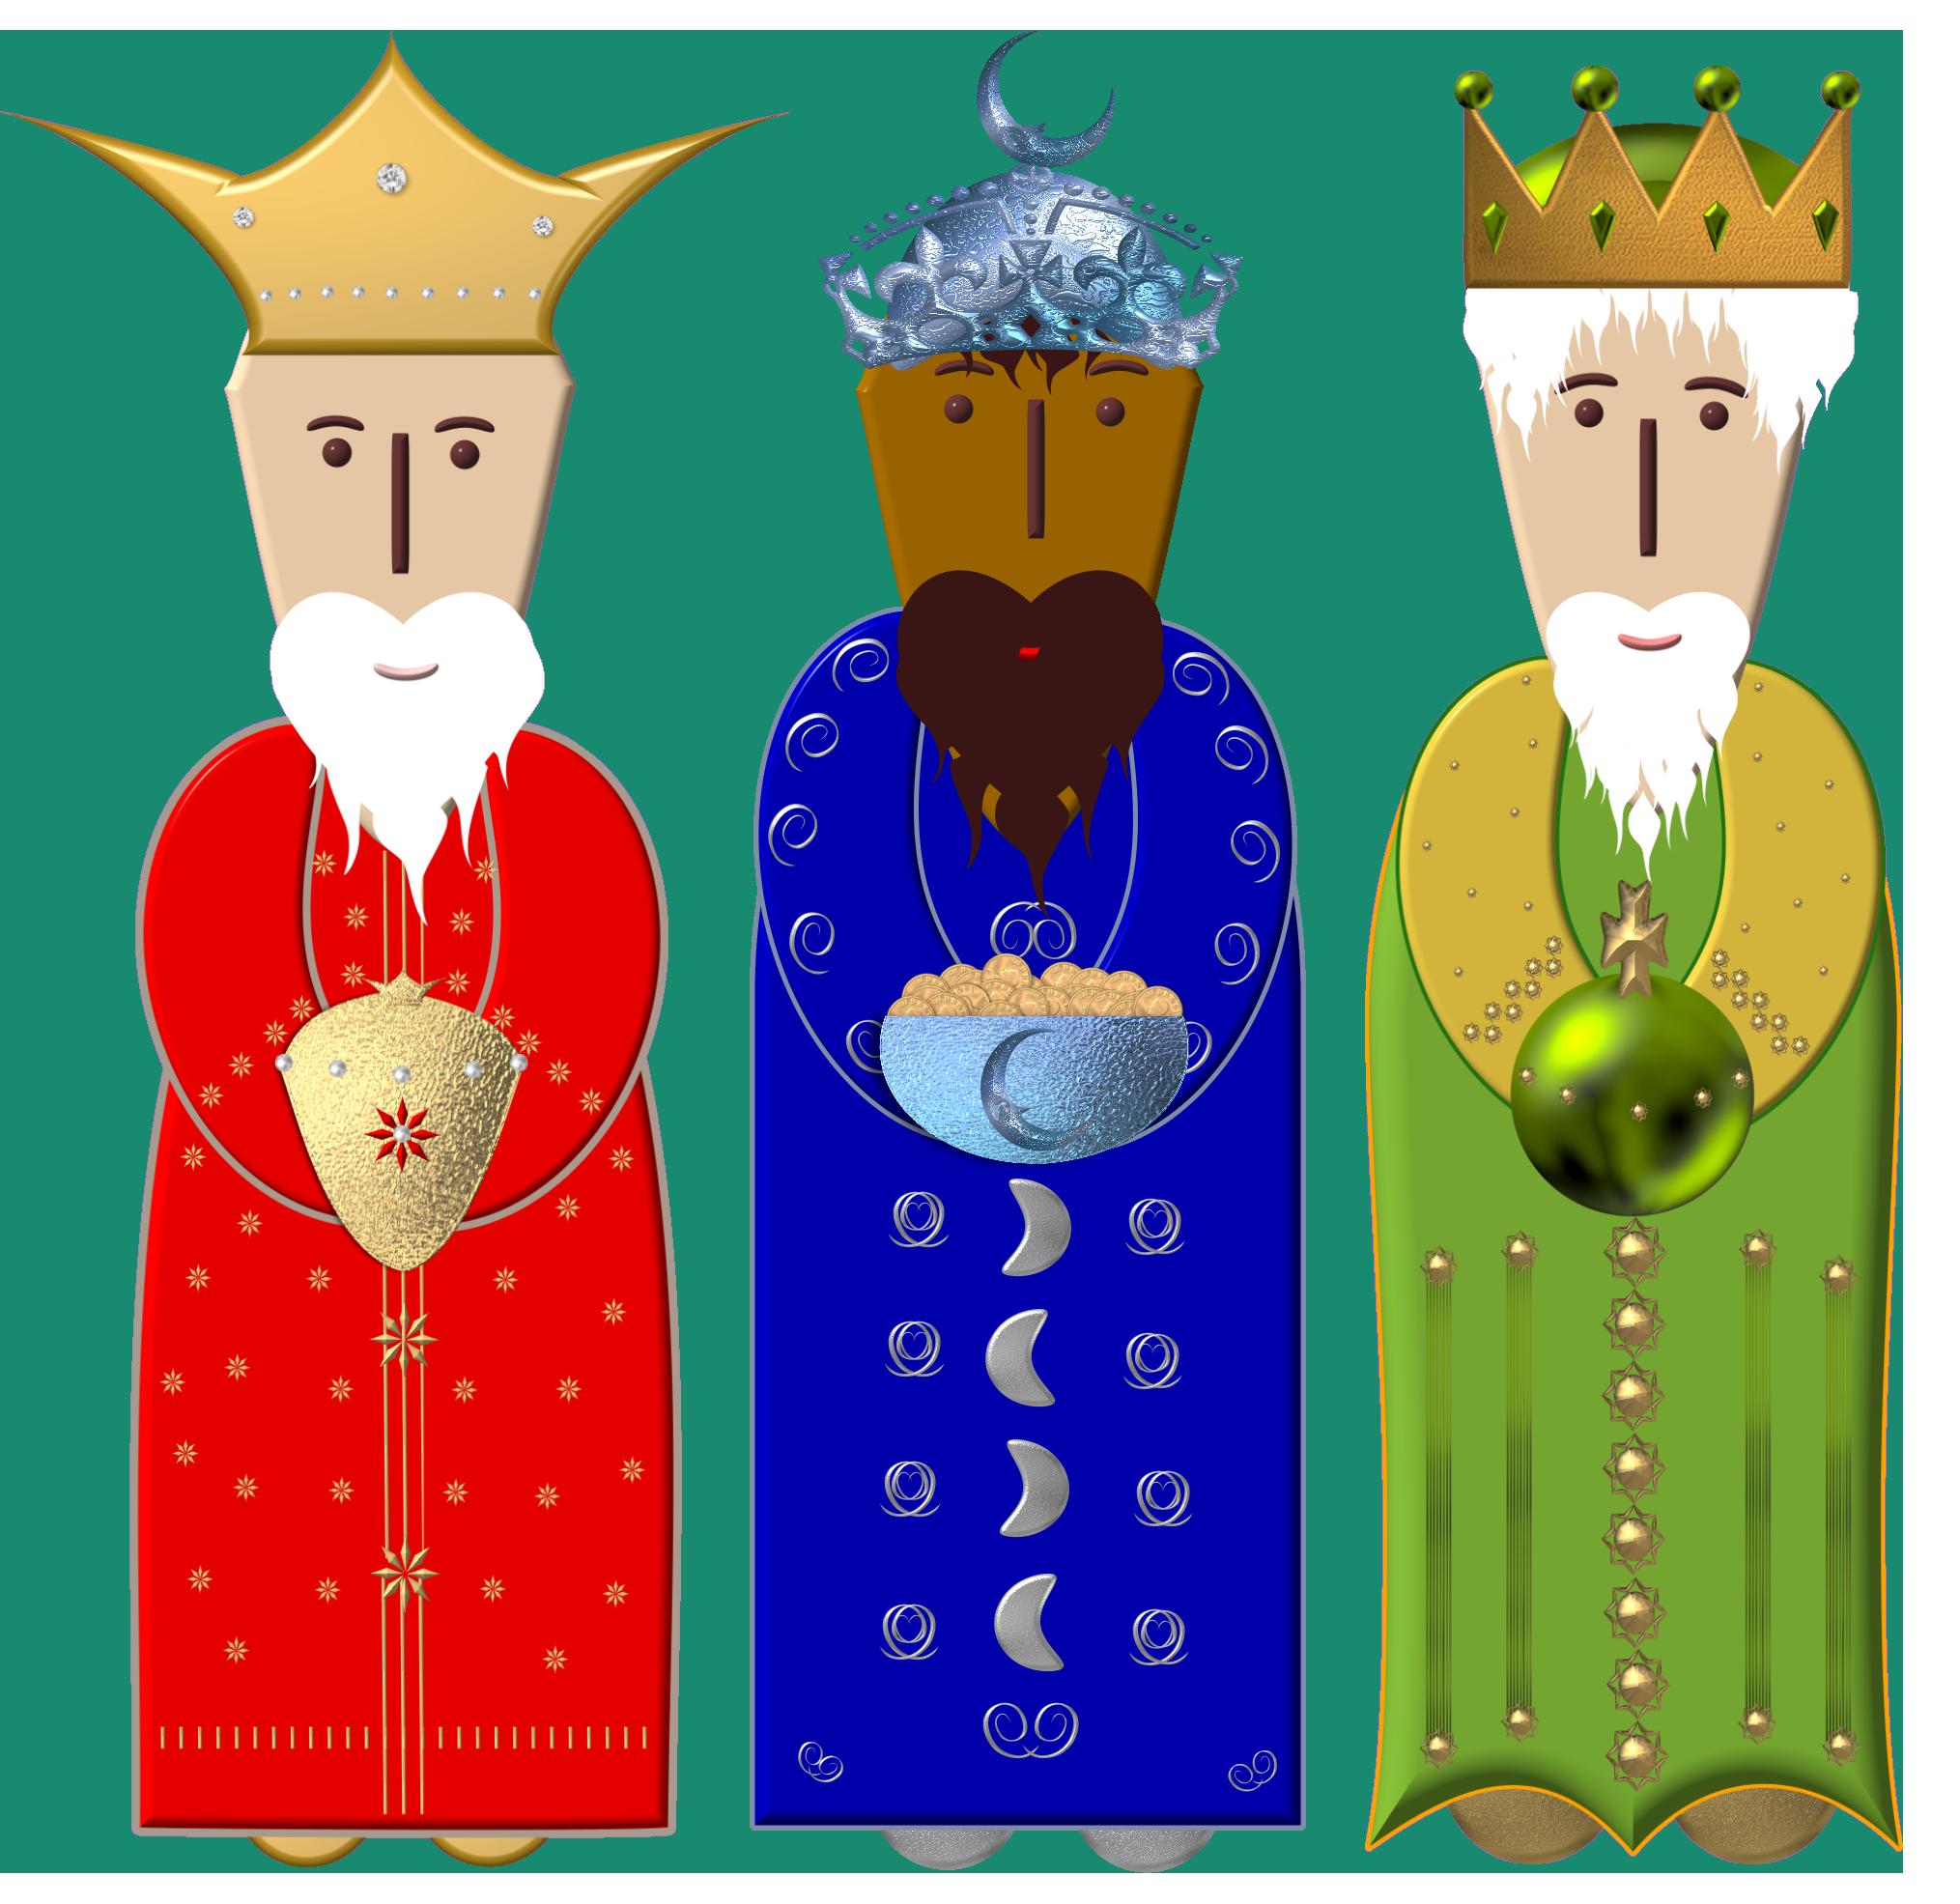 Nativity clipart wisemen, Nativity wisemen Transparent FREE.